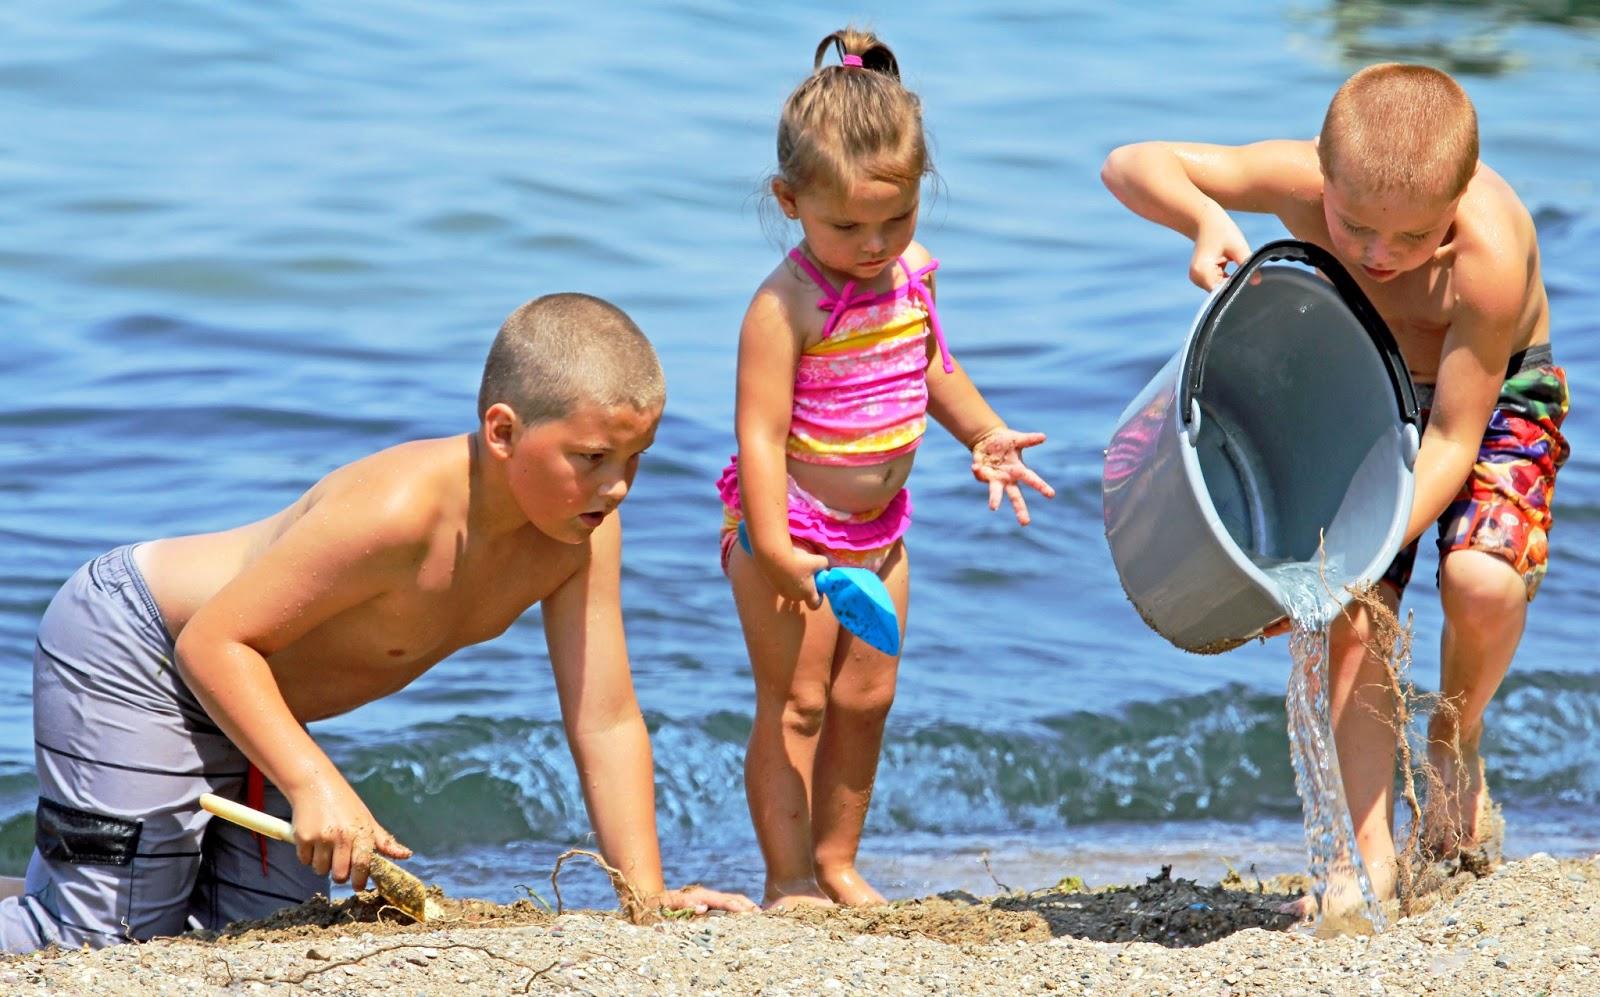 Kids Swimming In A Lake funke photos: at the lake: kids at play